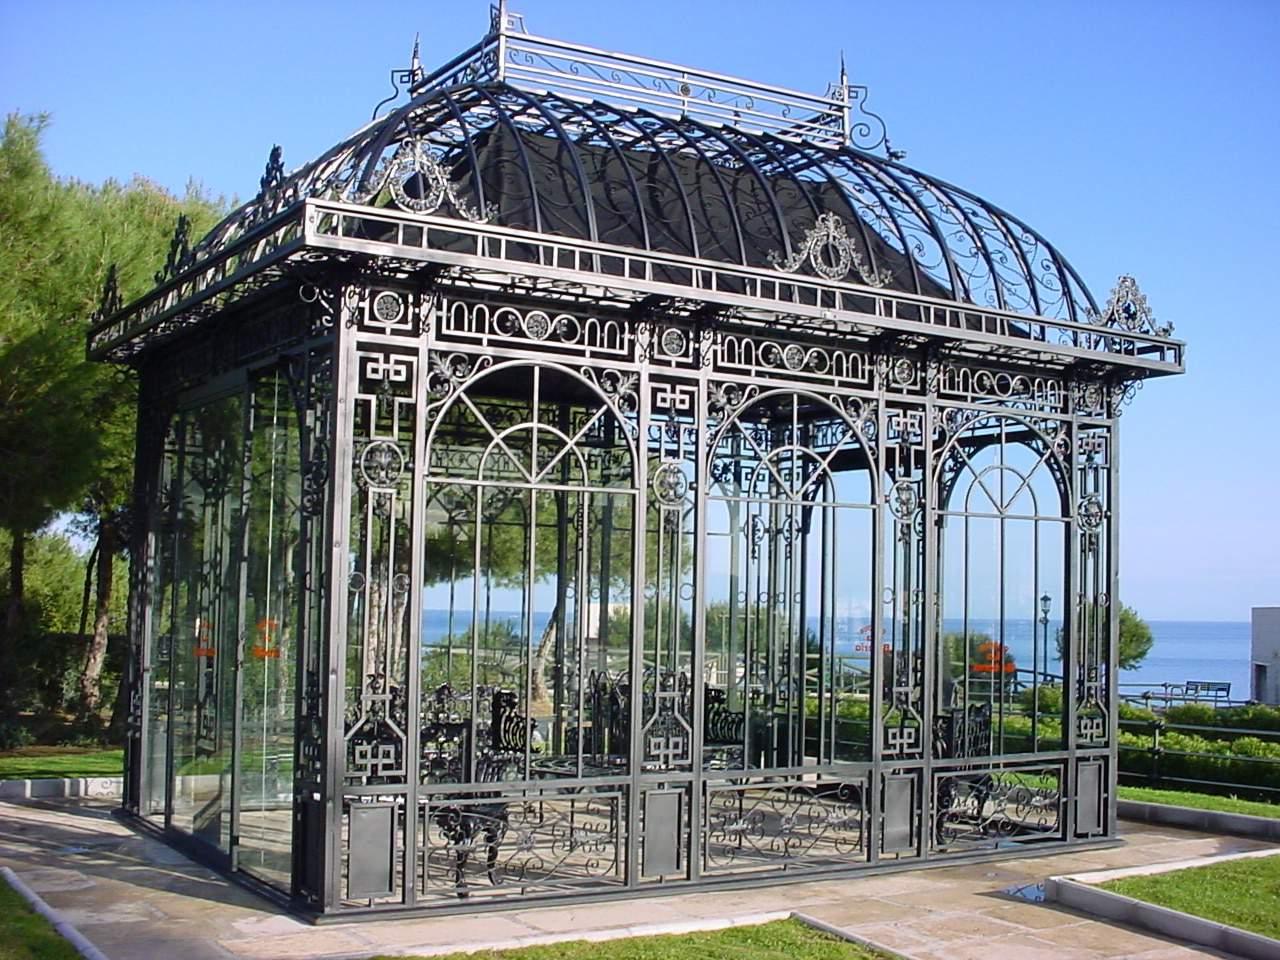 Pavillion_in_Parque_de_Bateria,_Torremolinos